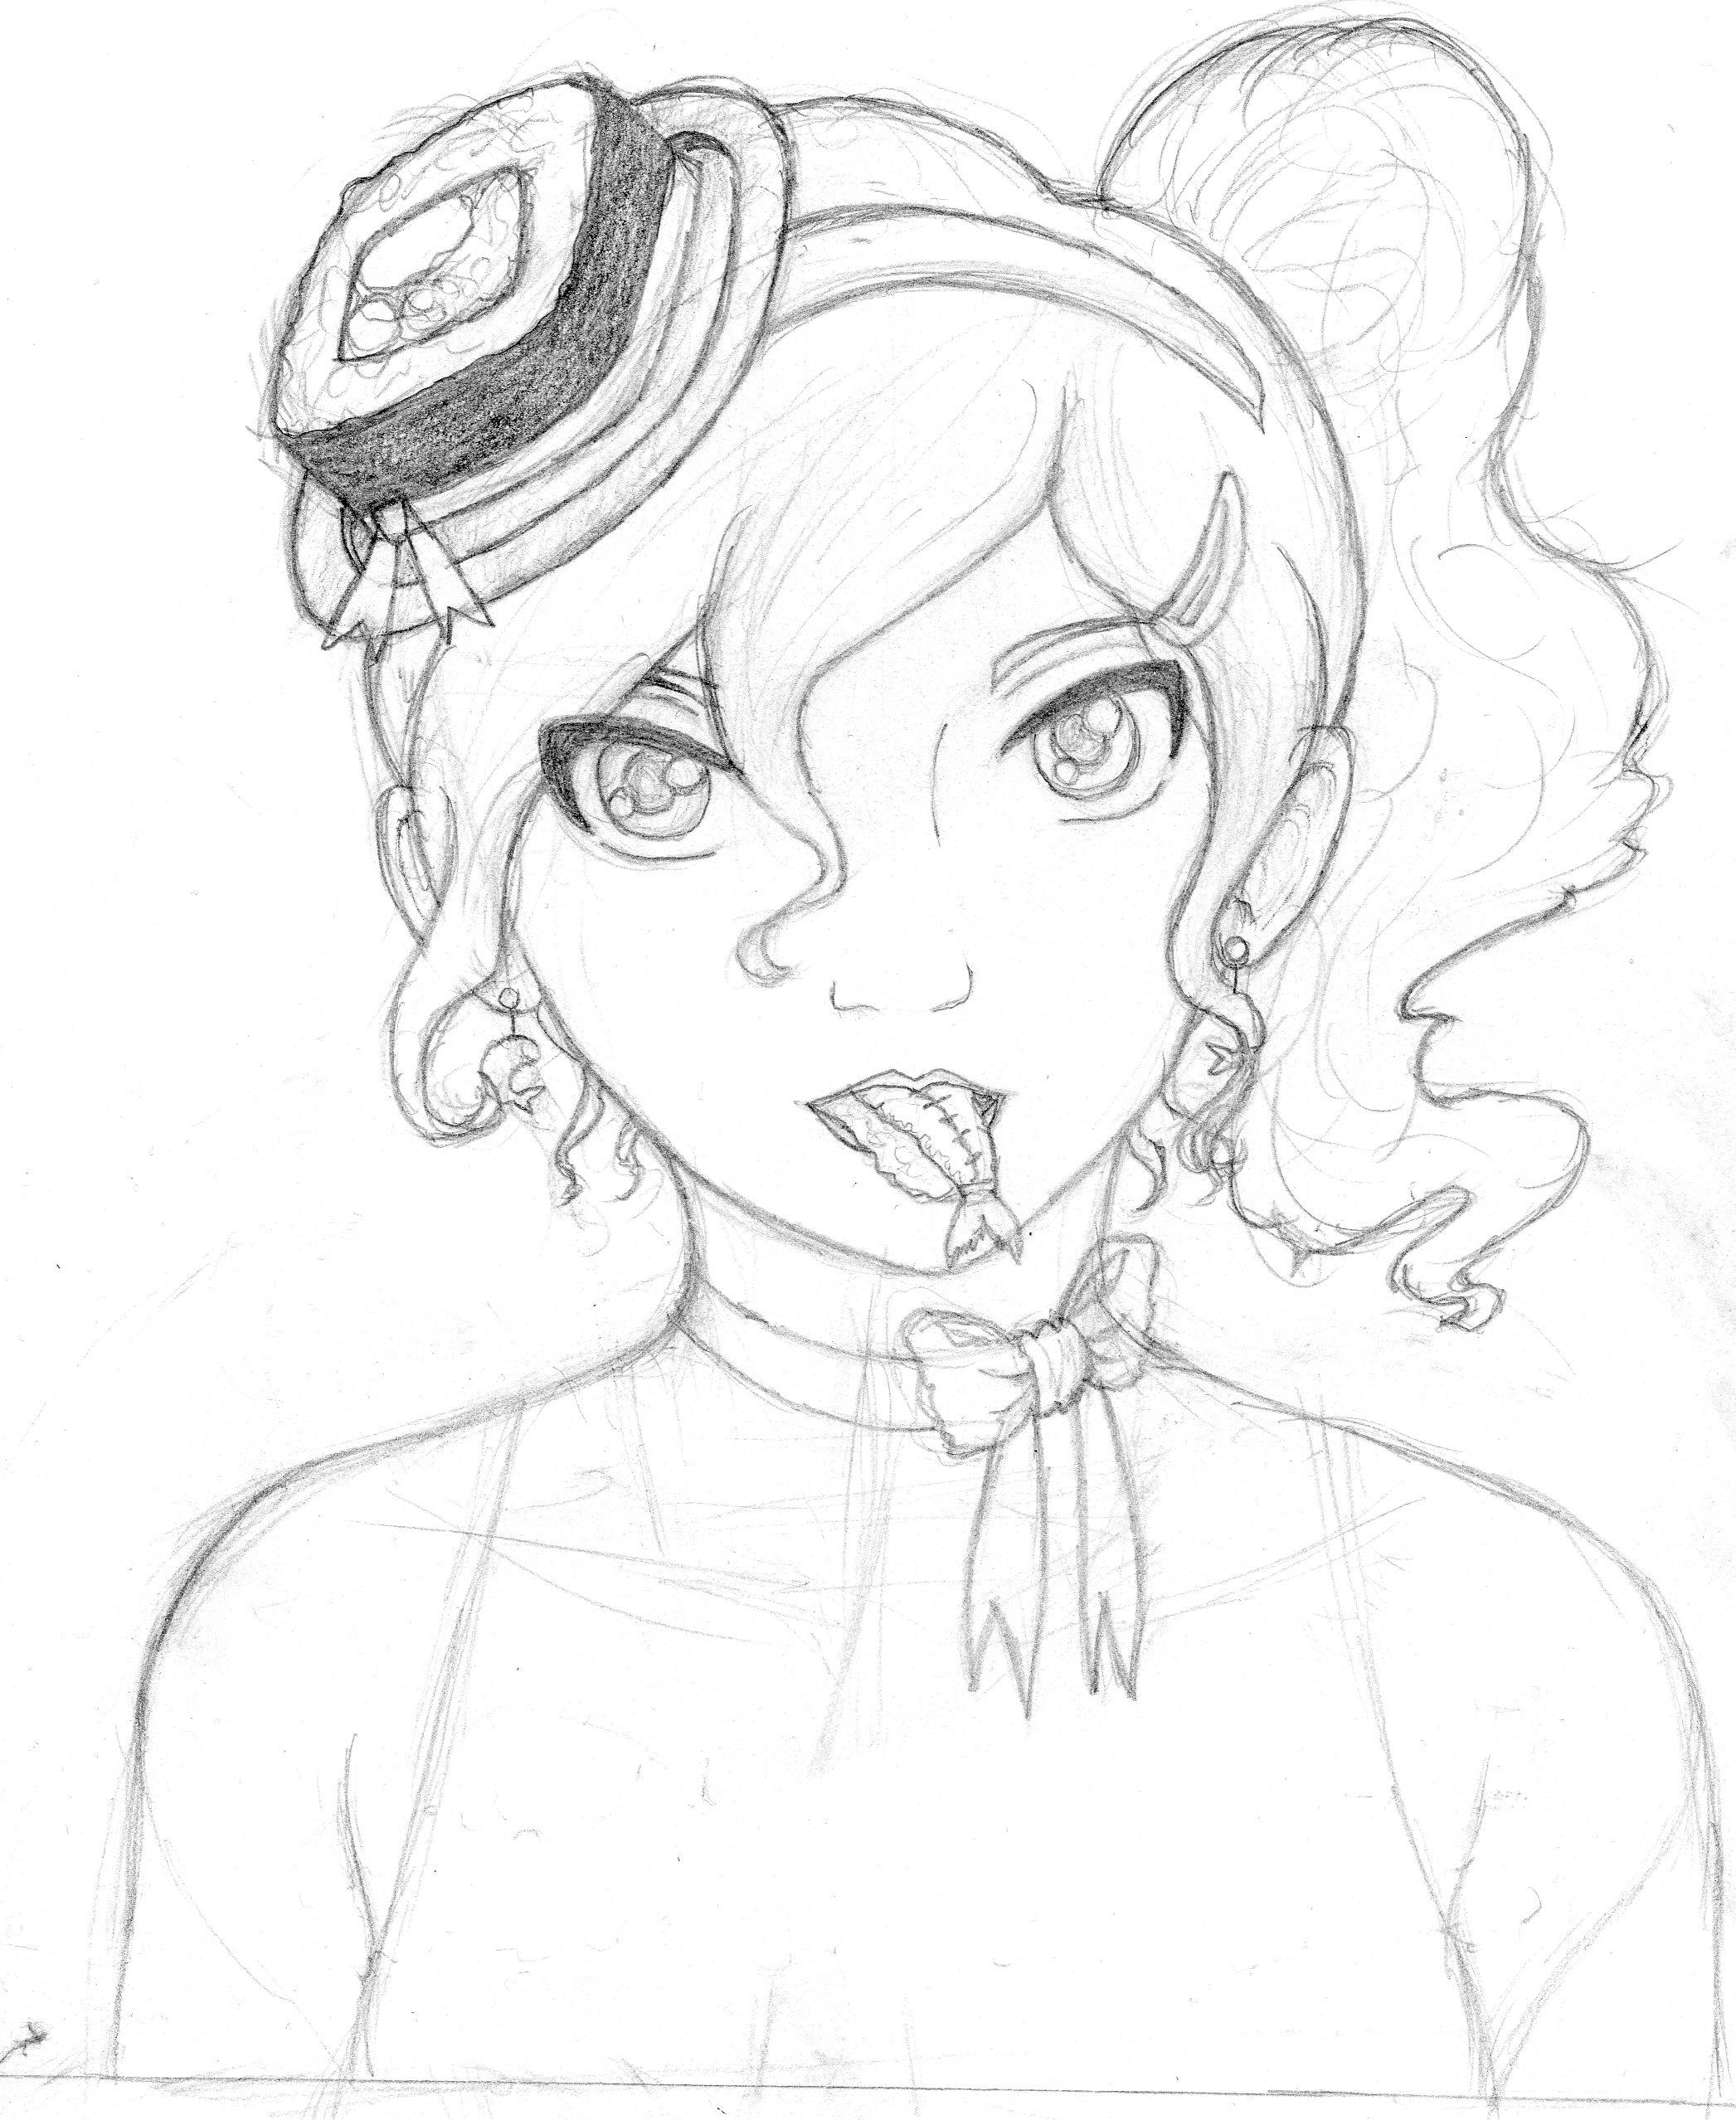 2093x2556 Anime Style Drawings Anime Style Drawings Random Anime Style